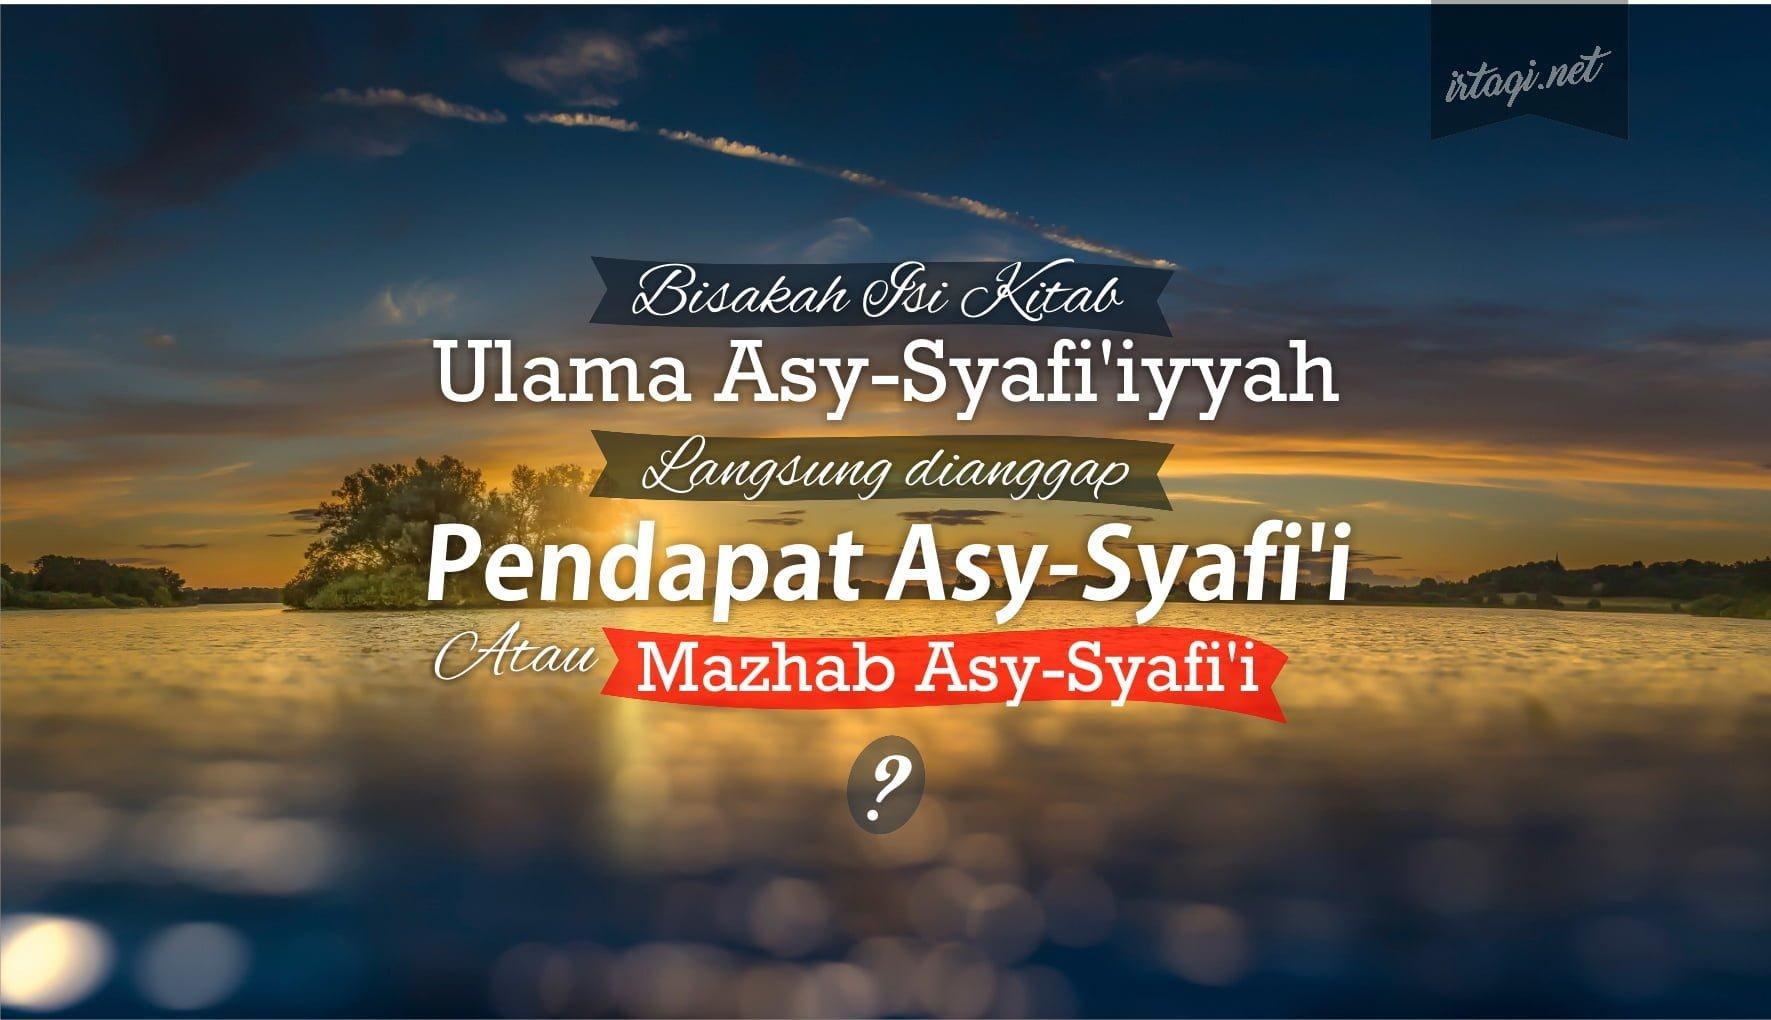 BISAKAH ISI KITAB ULAMA ASY-SYAFI'IYYAH LANGSUNG DIANGGAP PENDAPAT ASY-SYAFI'I ATAU MAZHAB ASY-SYAFI'I?